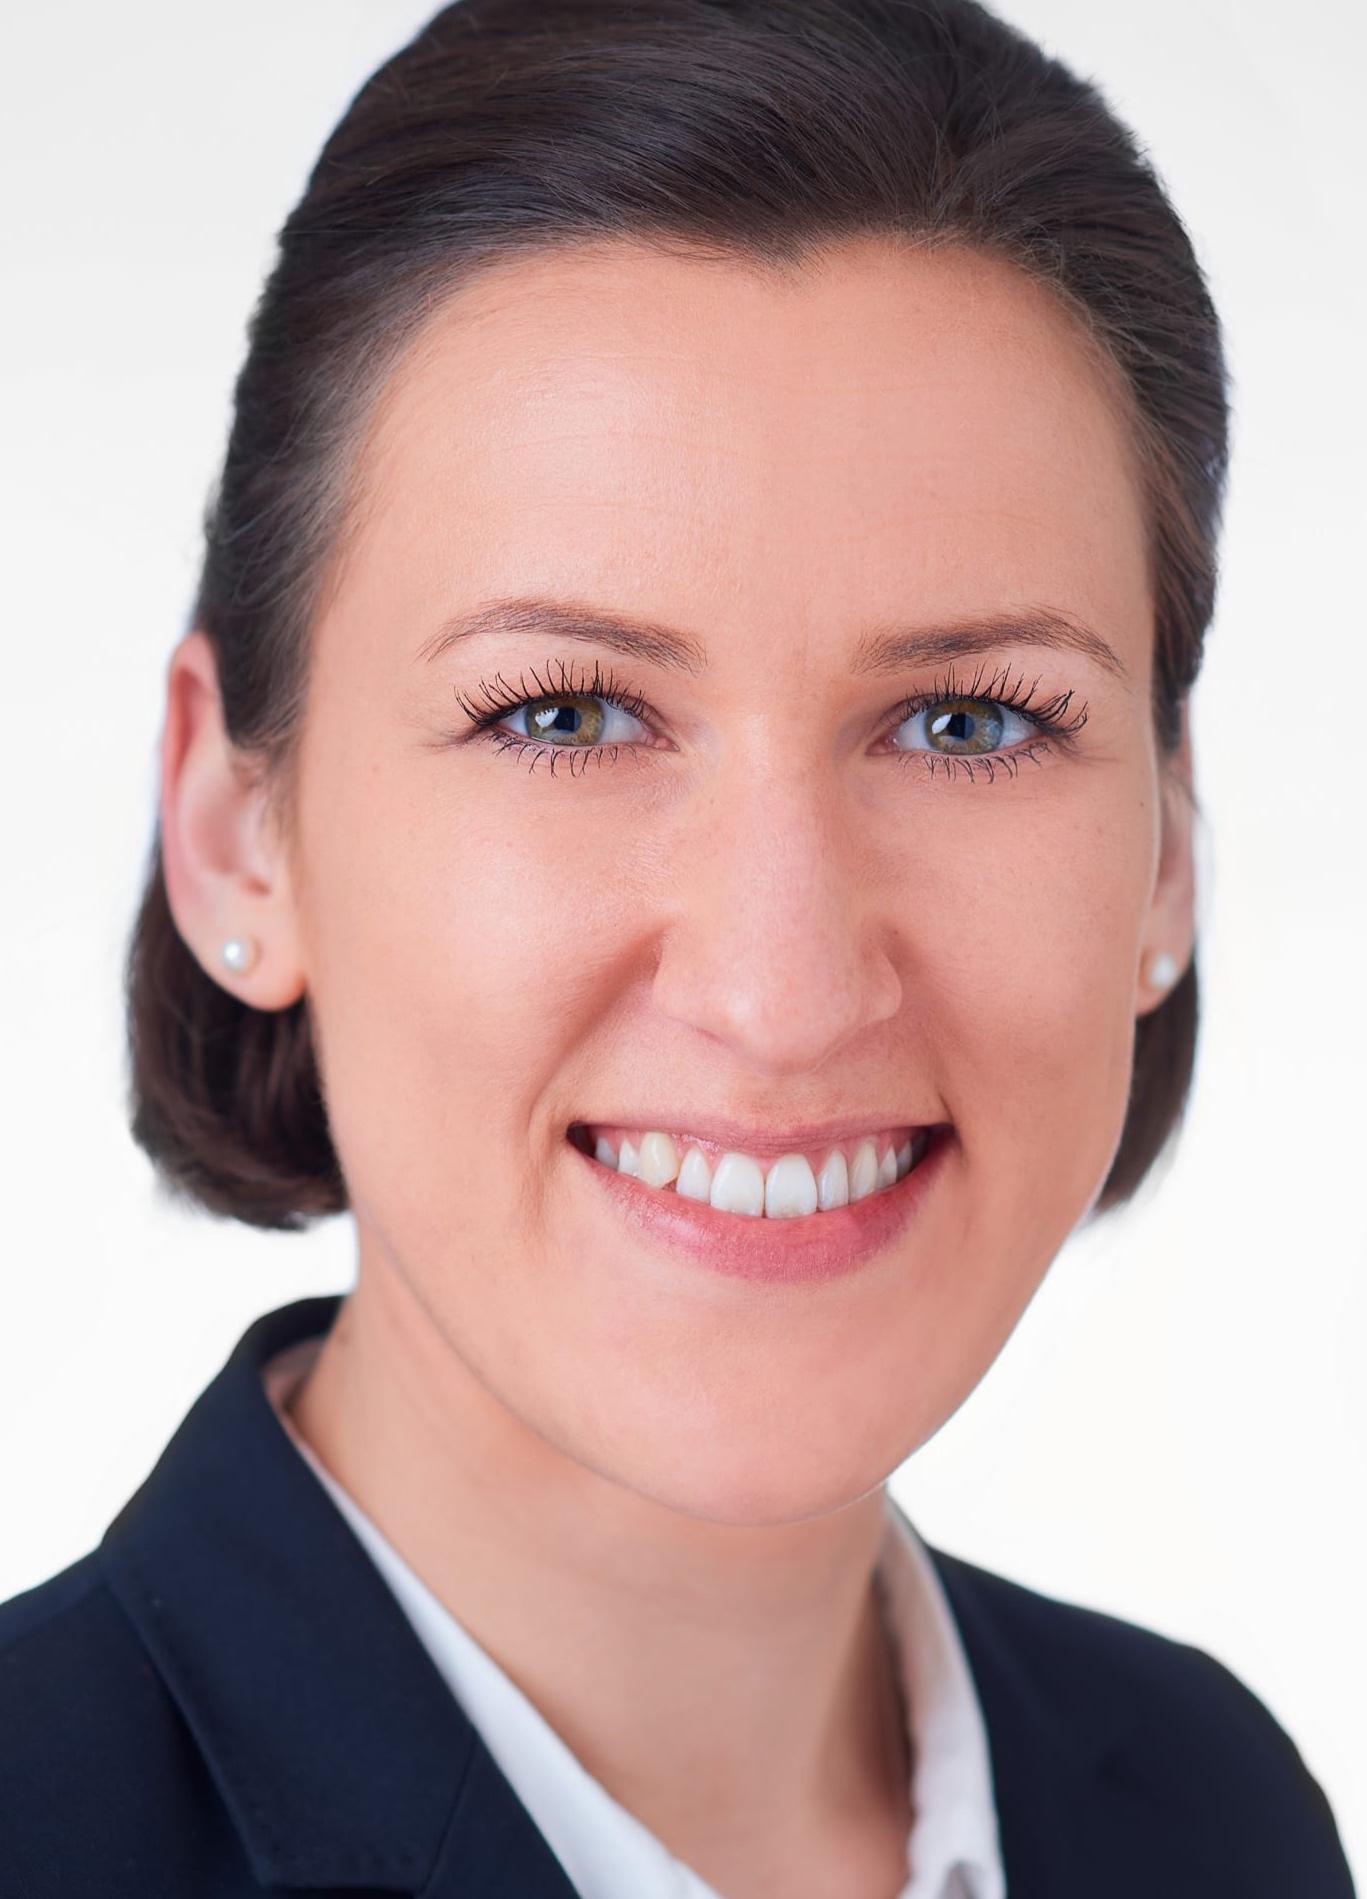 Mag. Tanja Gsöllpointner   seit 04/2018 Rechtsanwaltsanwärterin bei Mag. Alain Danner